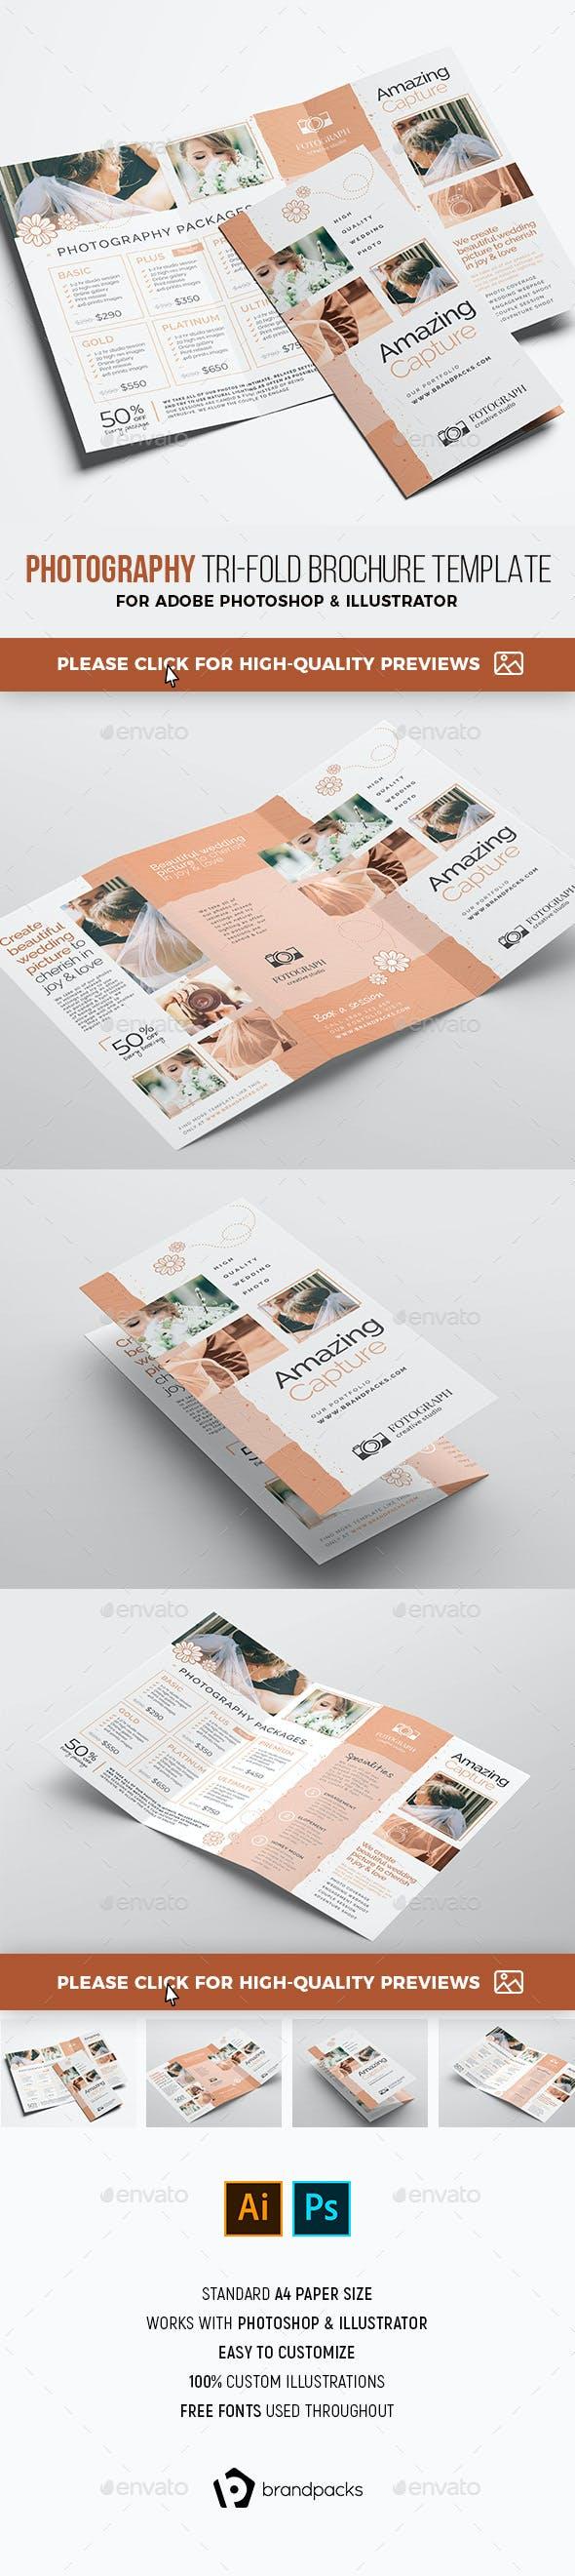 Photography Service Tri-Fold Brochure